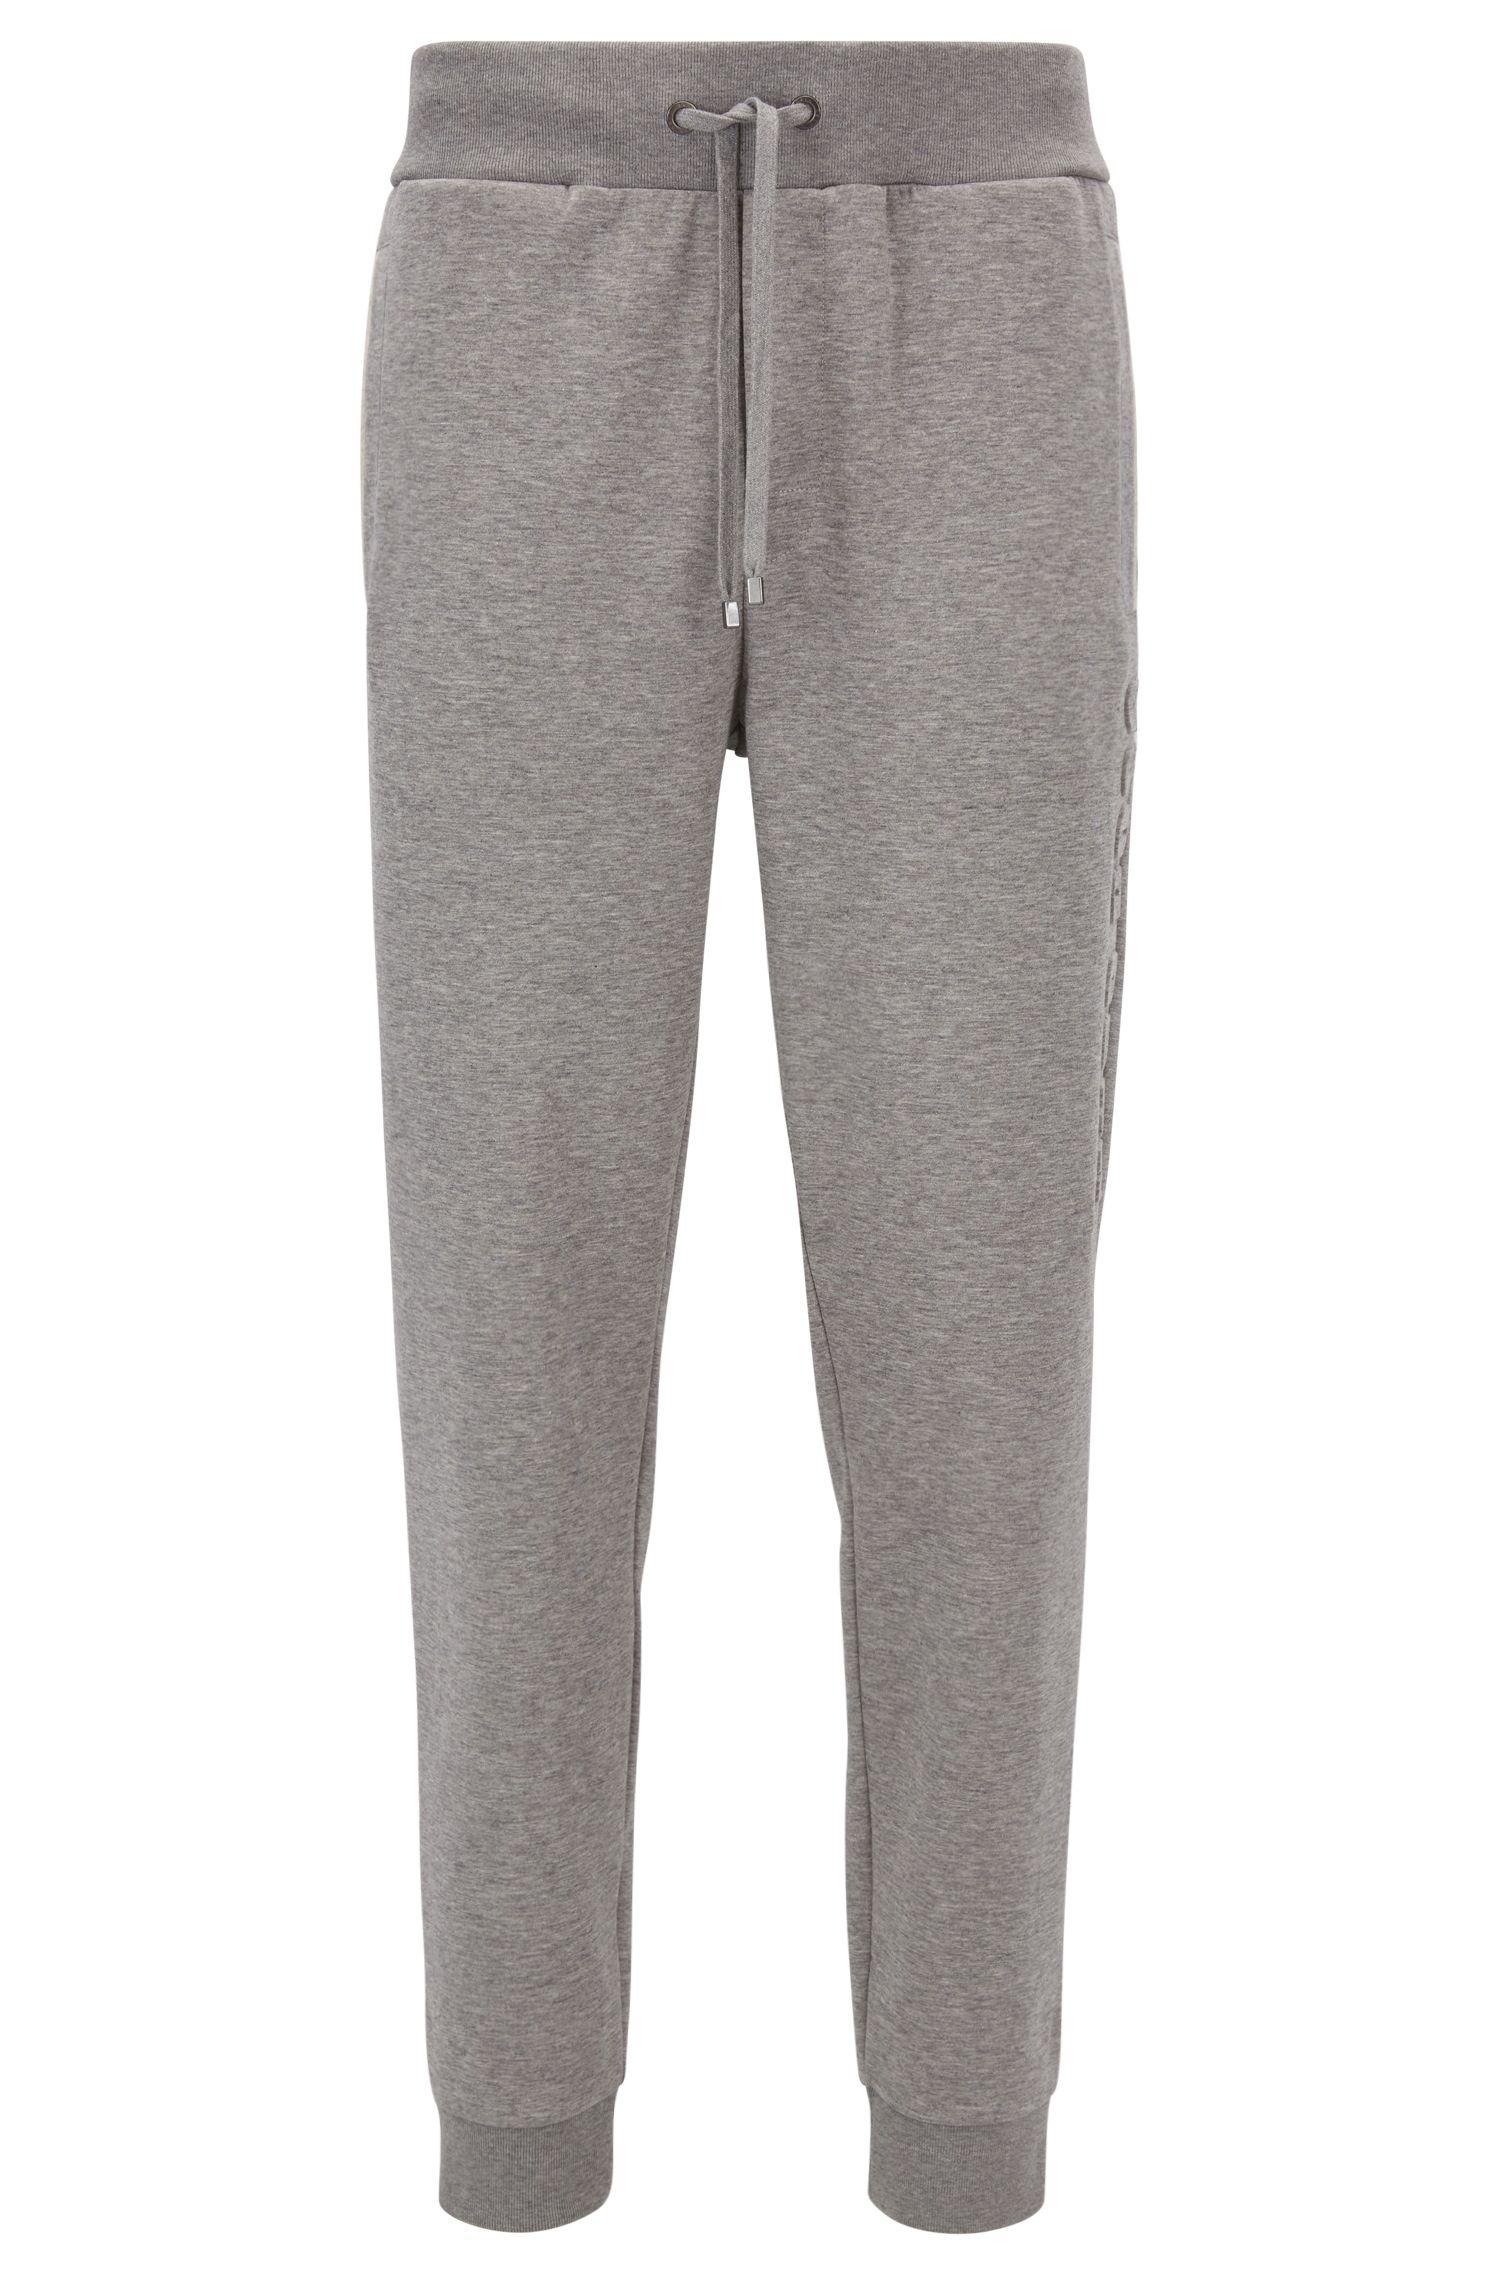 Cotton-blend loungewear bottoms with vertical logo